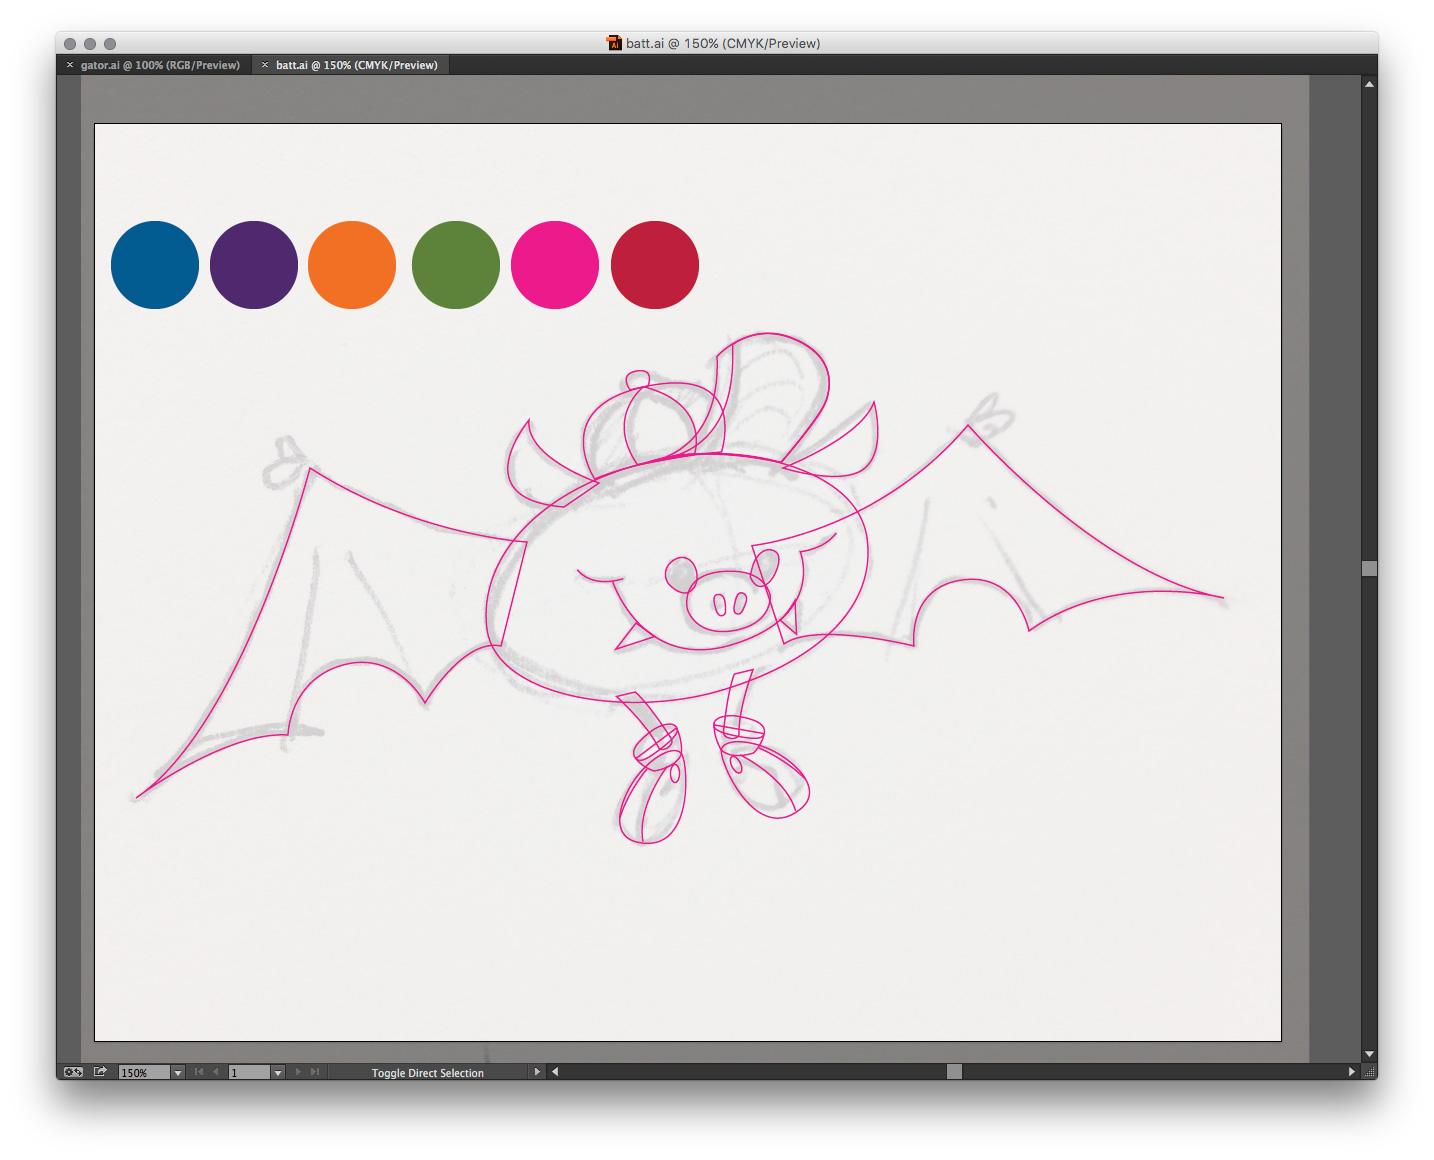 Shapes drawn in Illustrator.